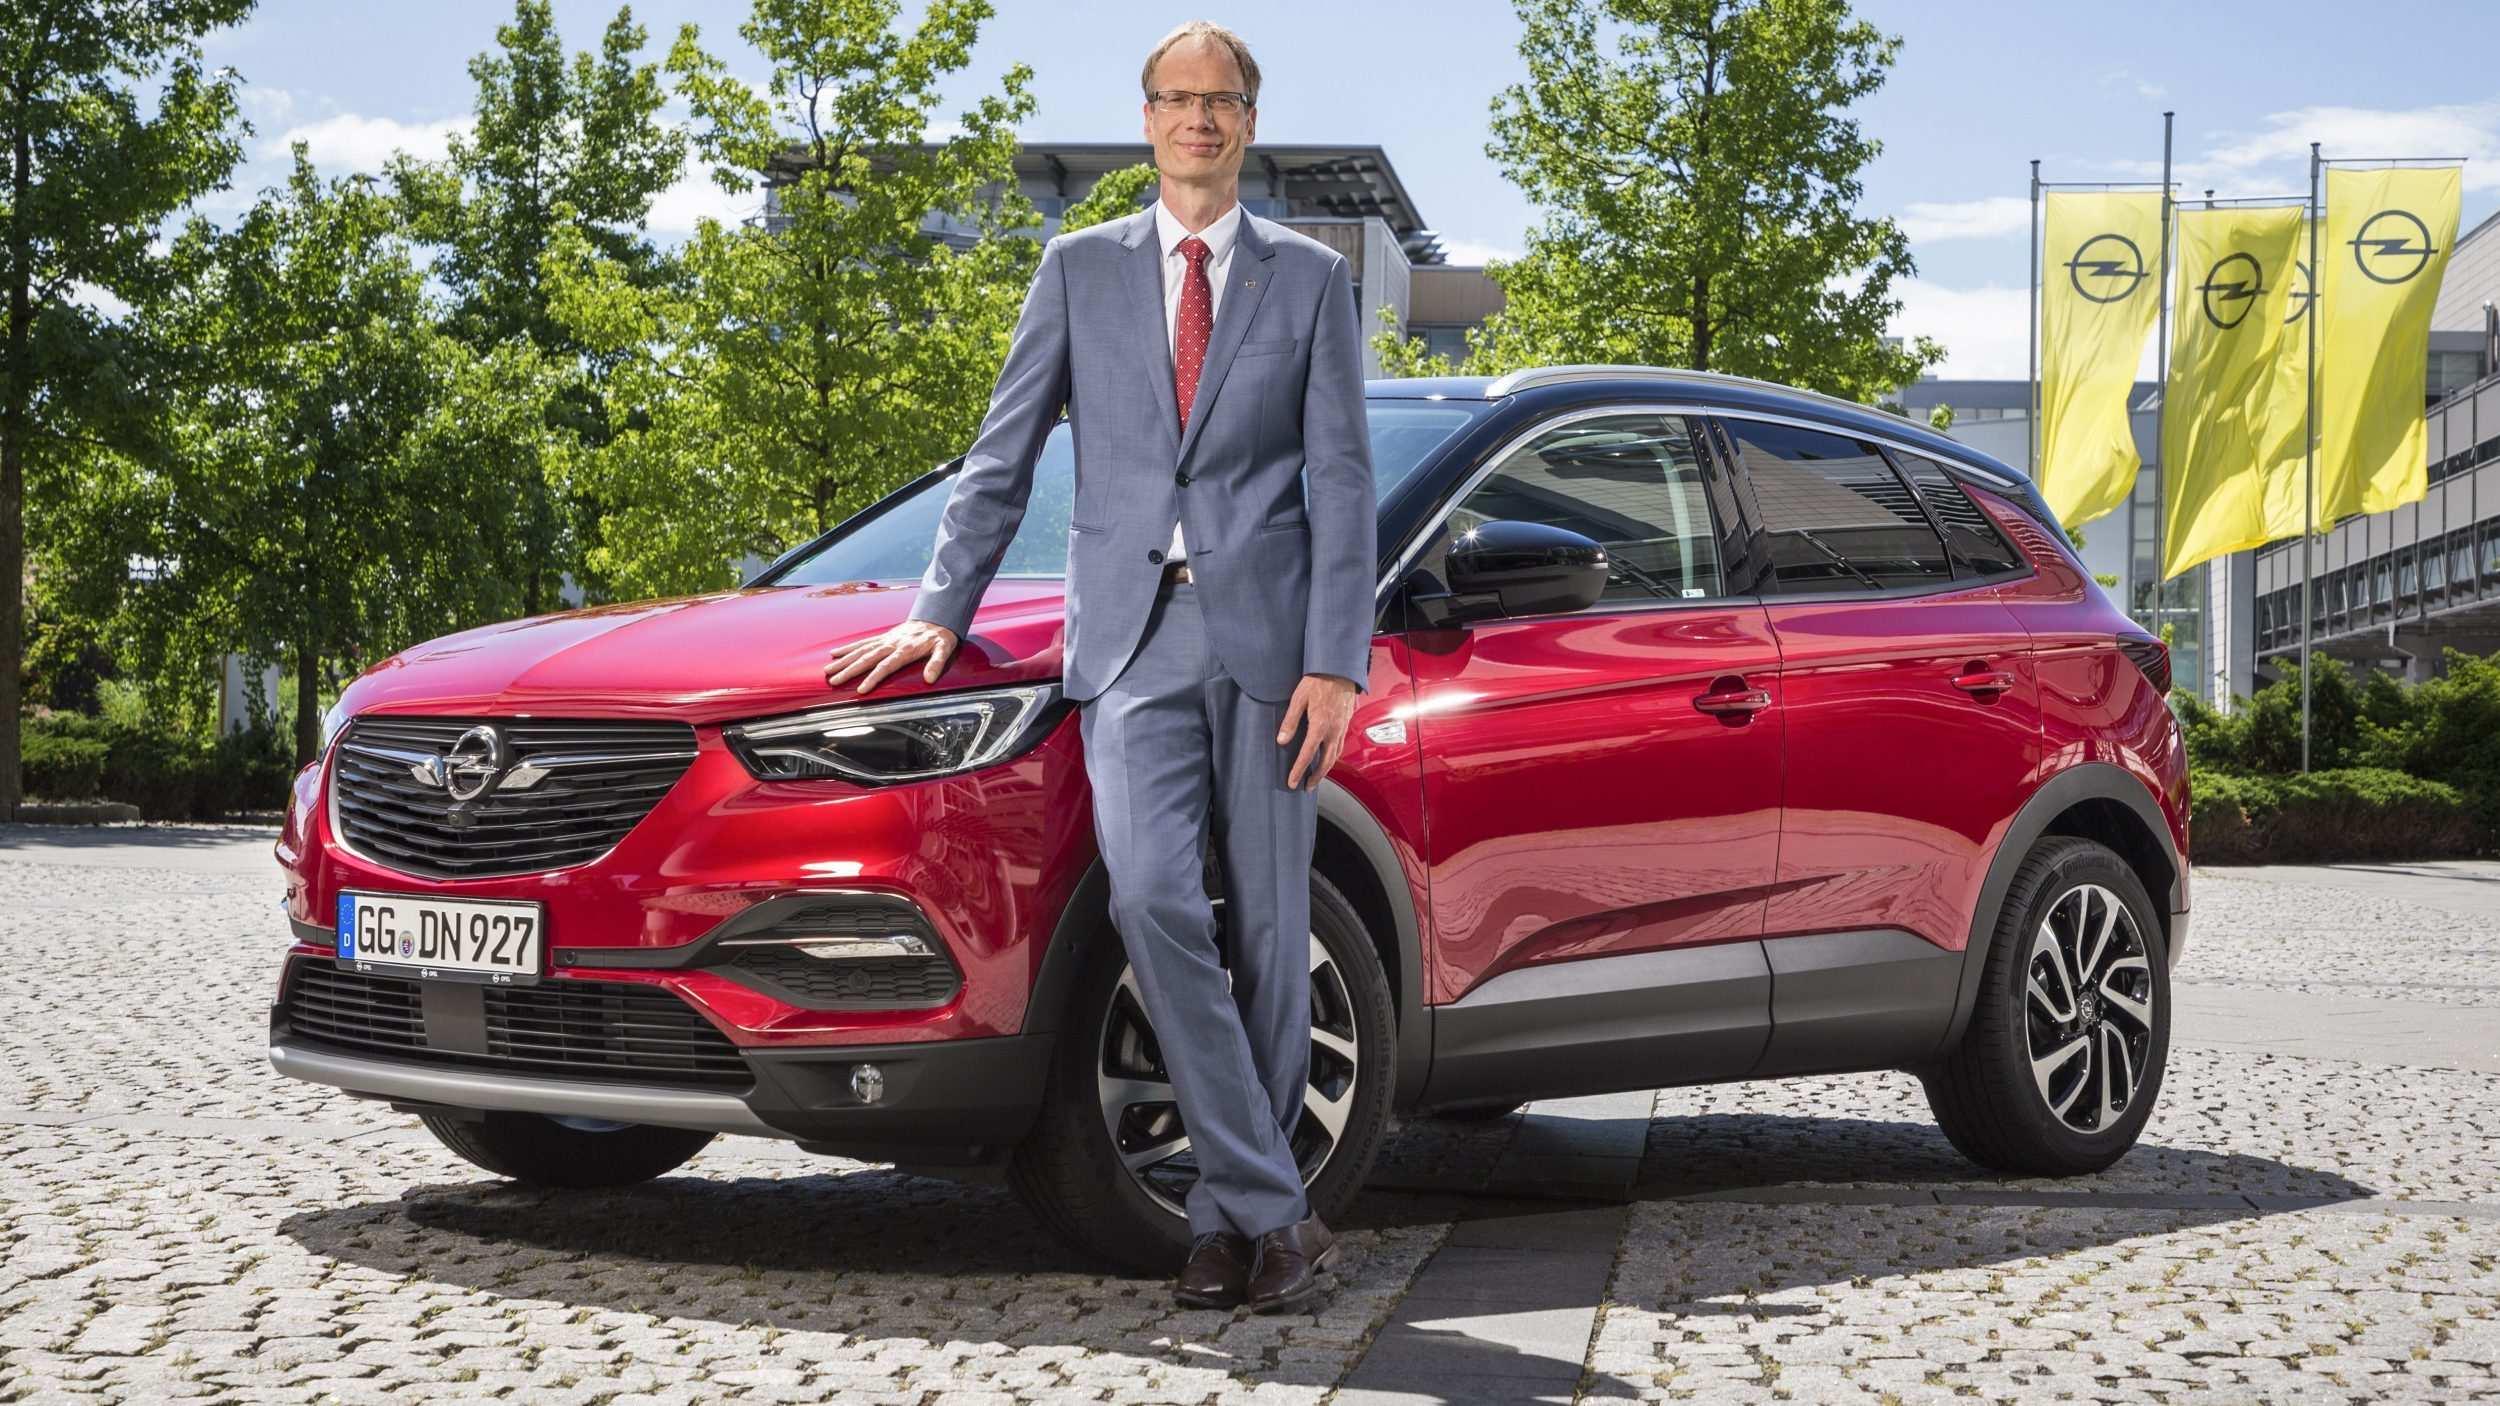 11 Concept of Neue Opel Bis 2020 New Concept for Neue Opel Bis 2020